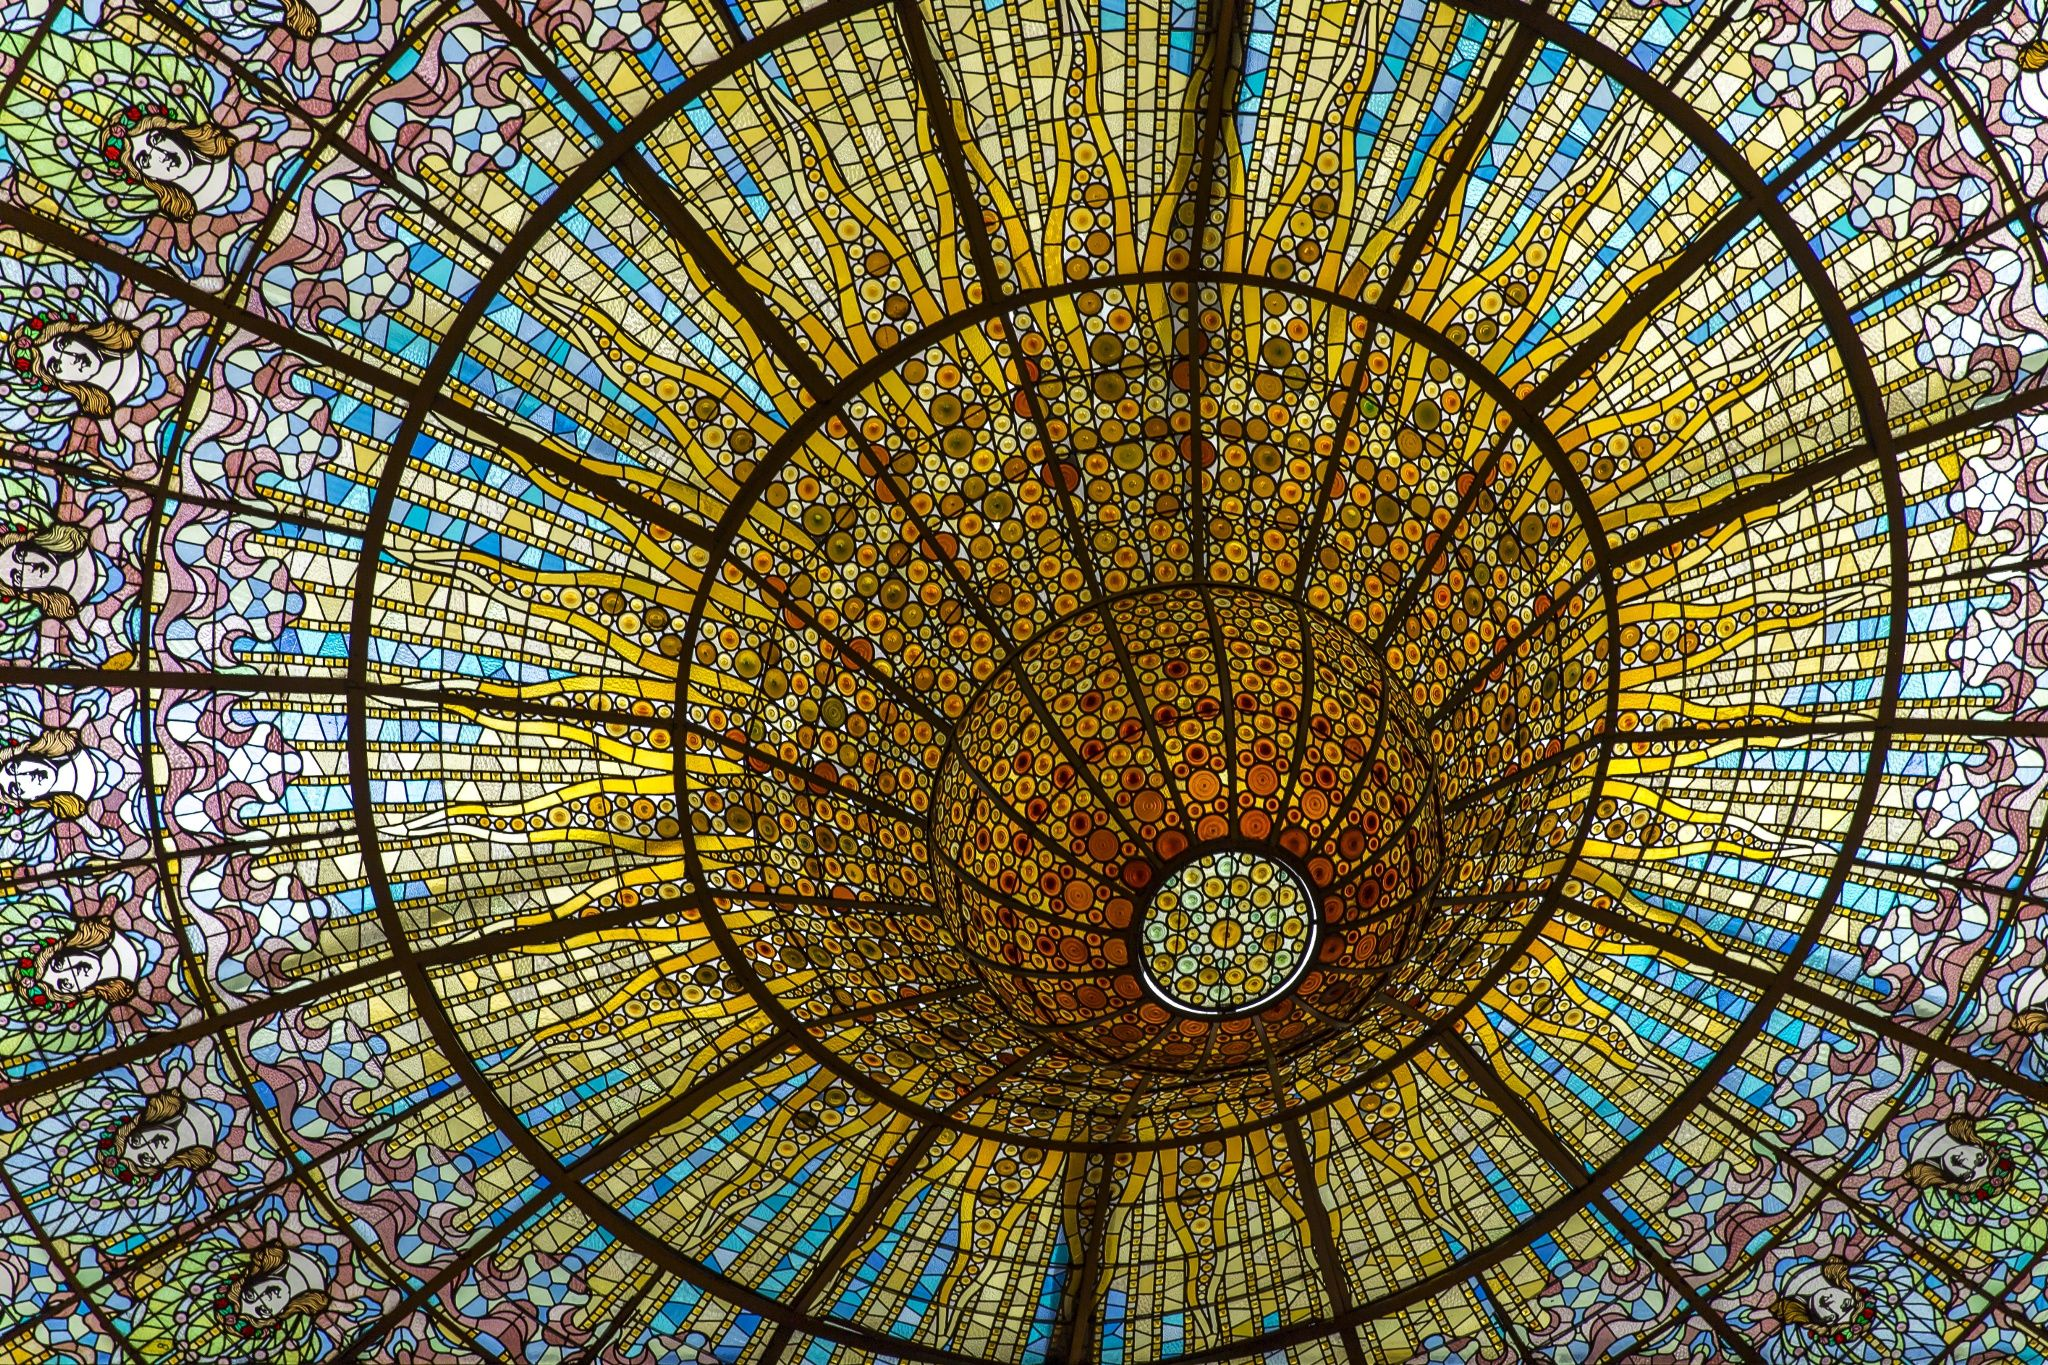 Photo Vitrall Central del Palau de la Música Catalana by Josep Novellas on 500px